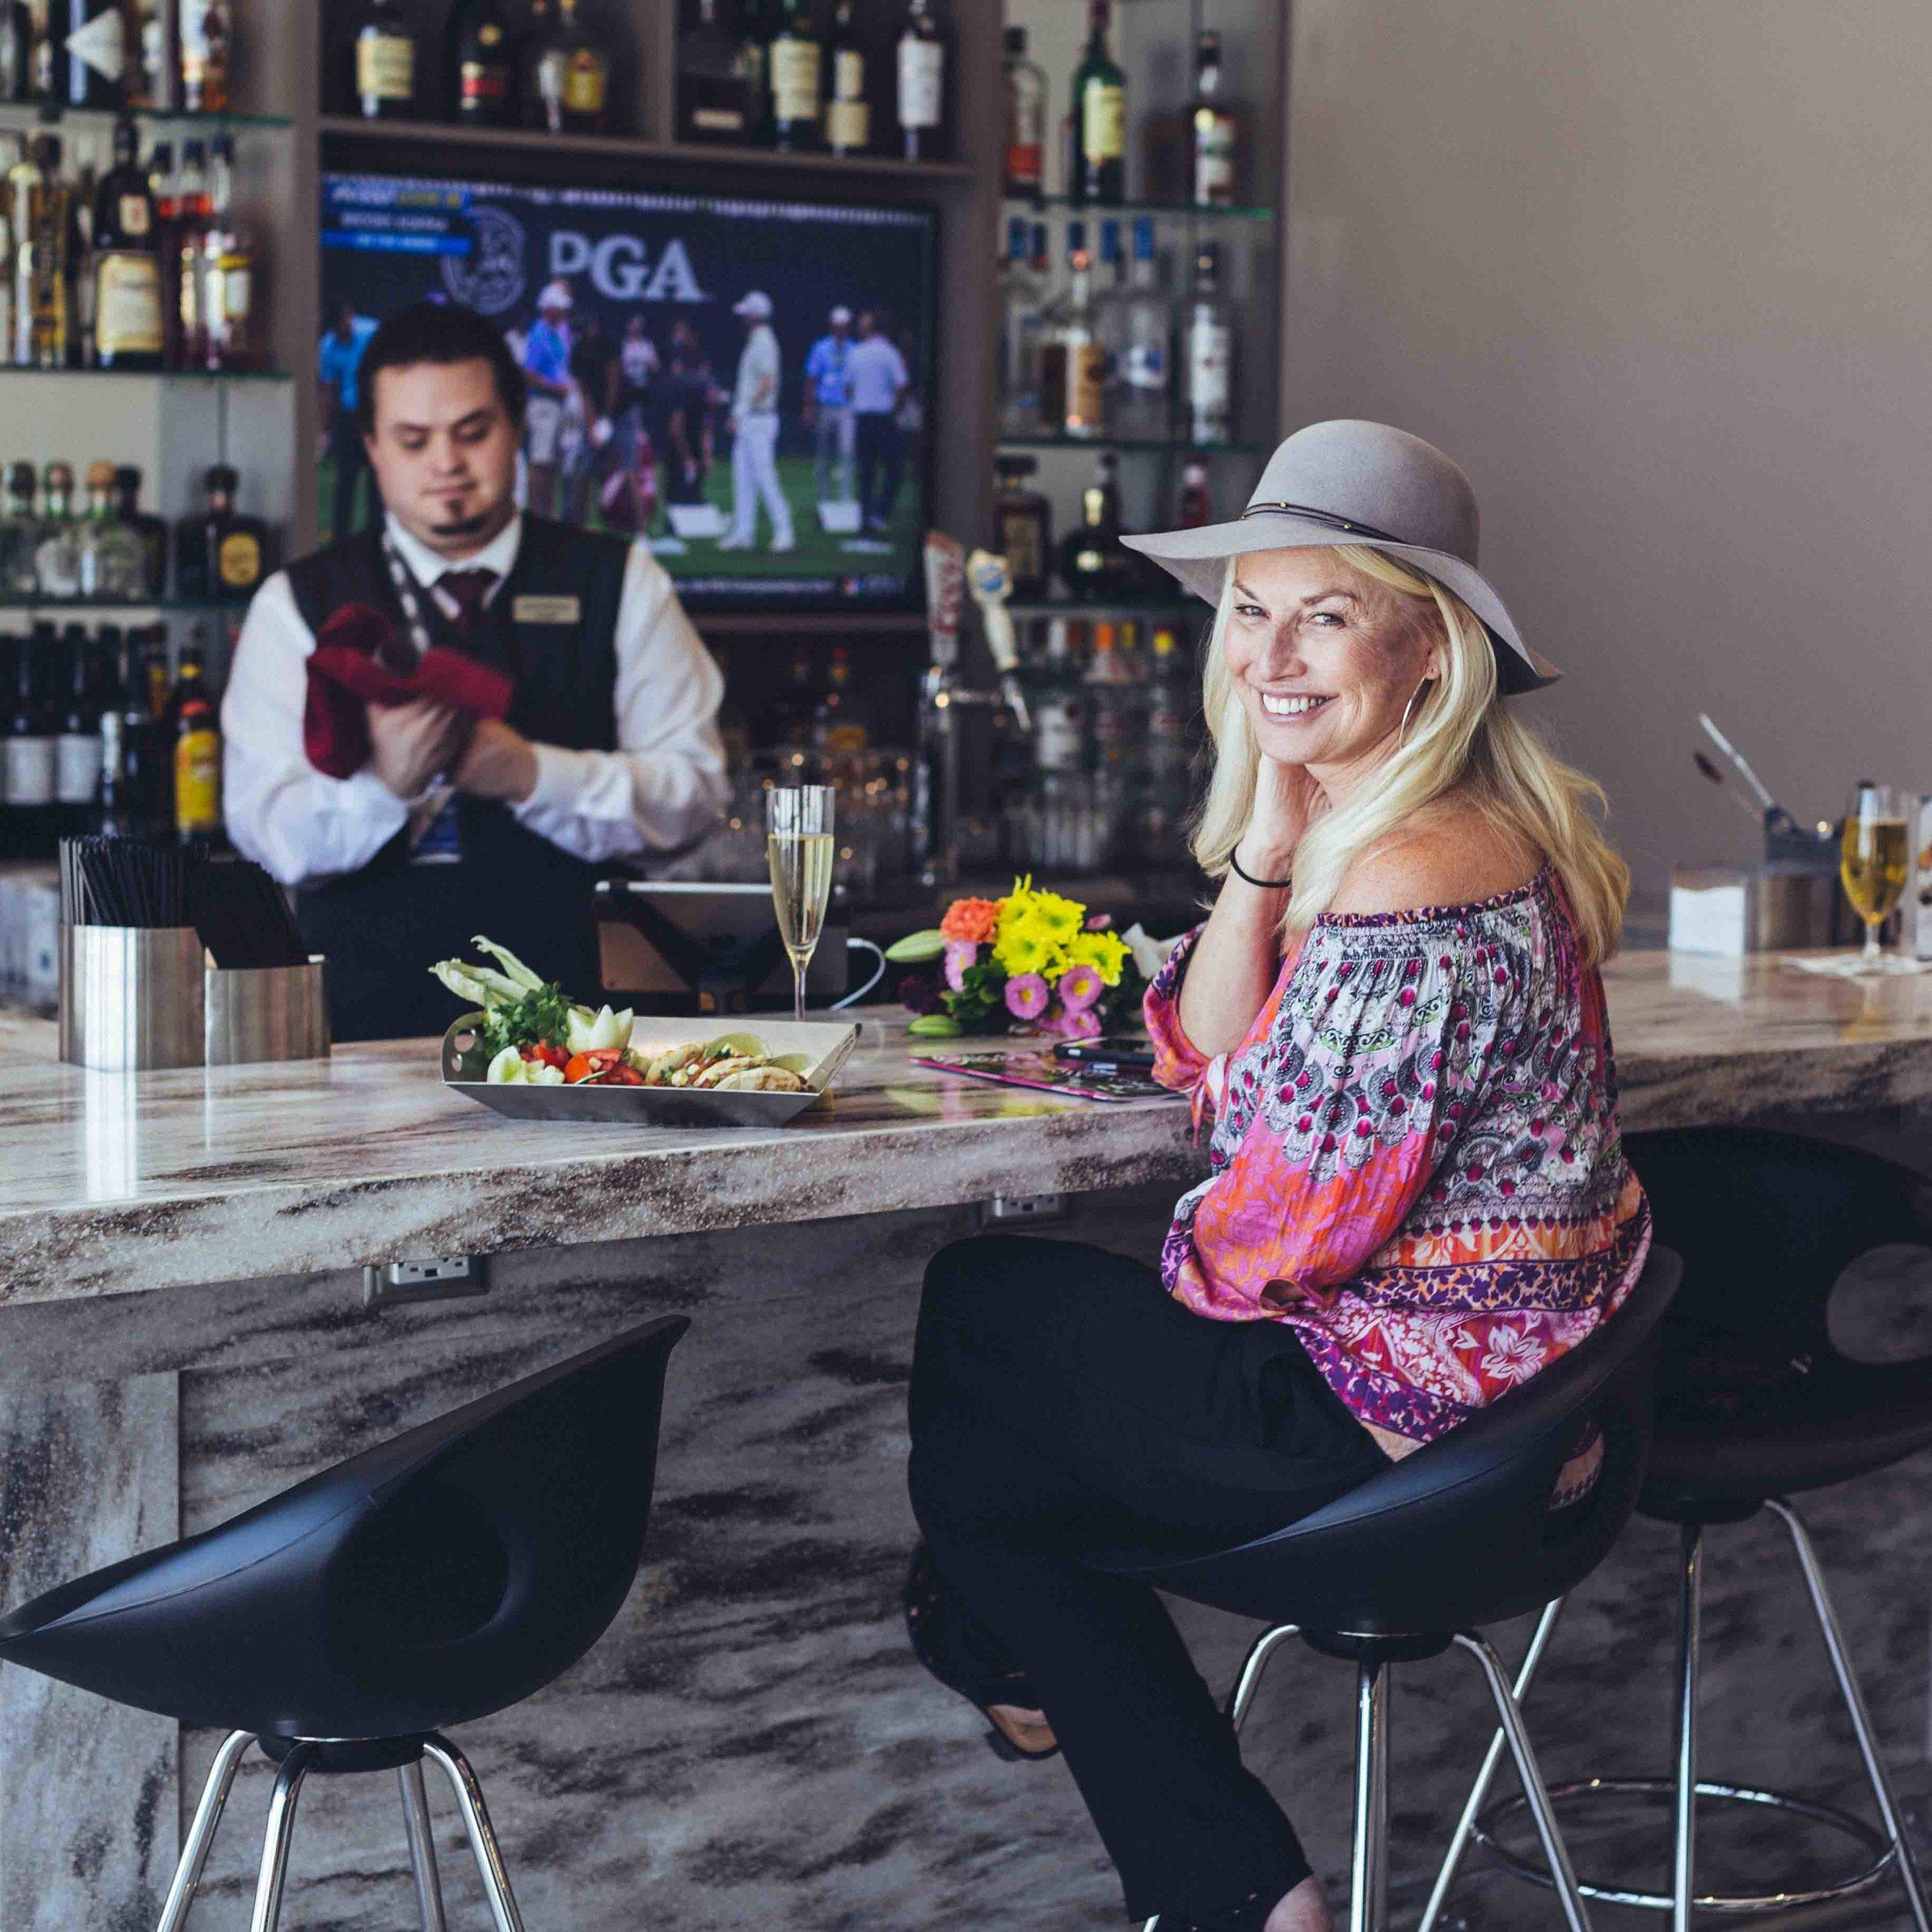 escape-lounge-reno-nevada-food-colin-smith-roundabout-grill-editorial-4.jpg